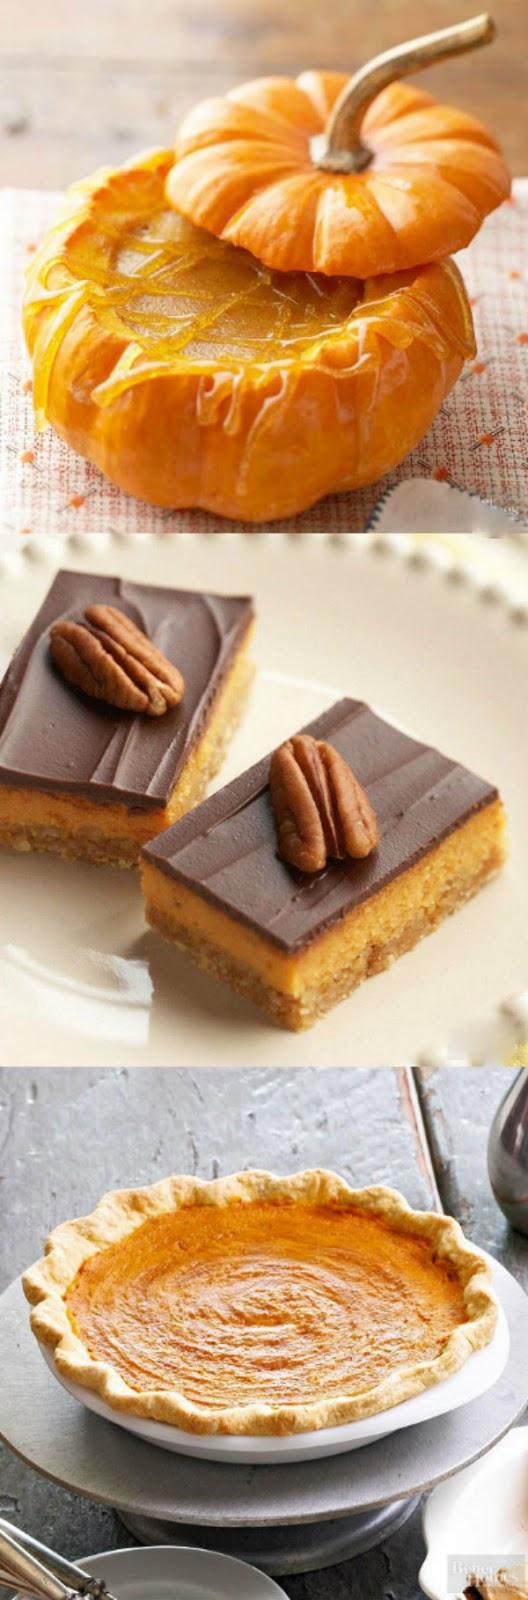 Ciao Newport Beach Yummy Dessert Ideas For Fall